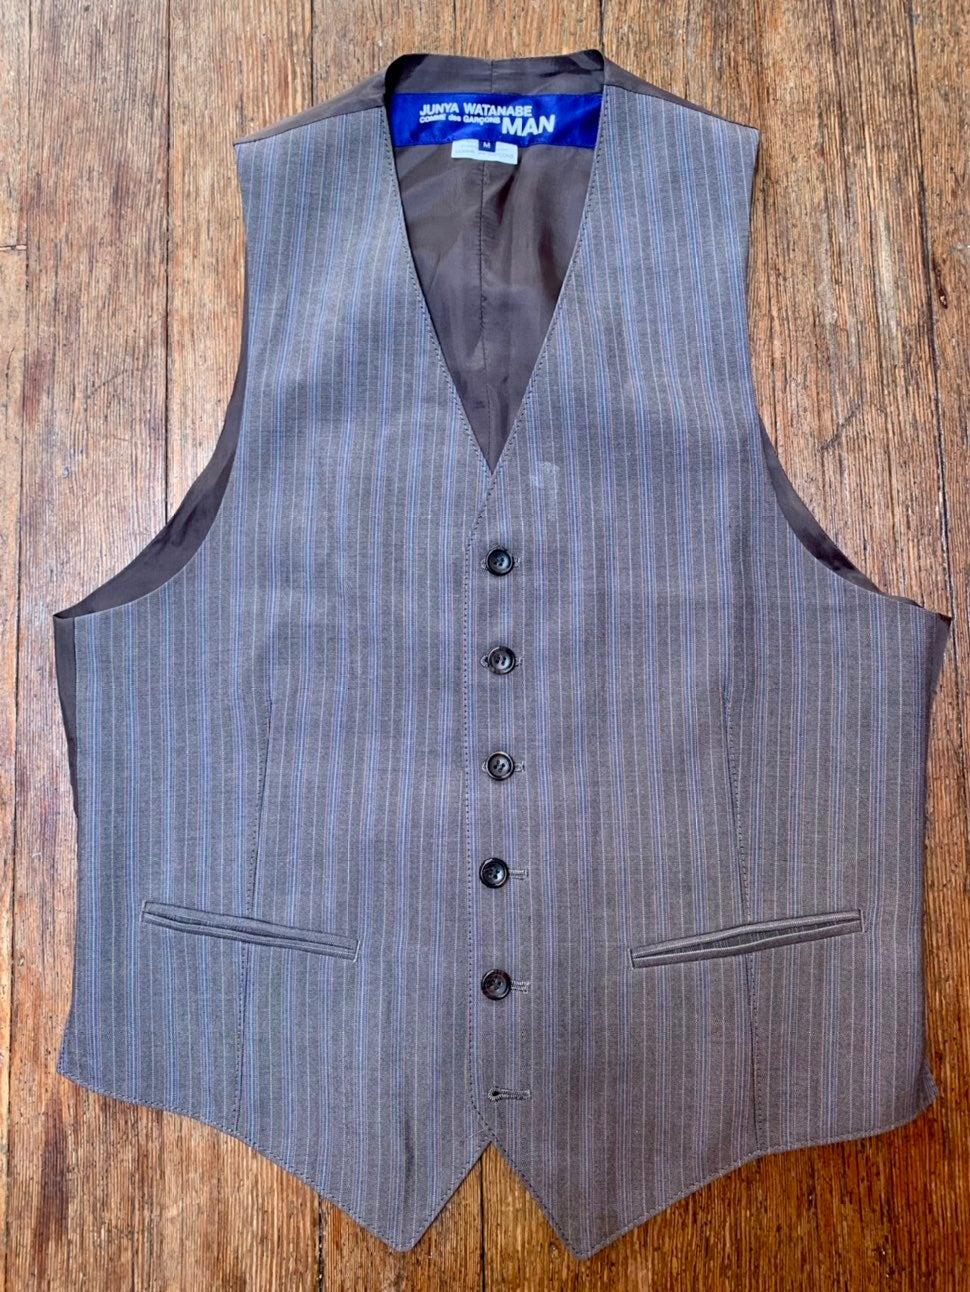 Junya Watanabe tailored Waistcoat in woo